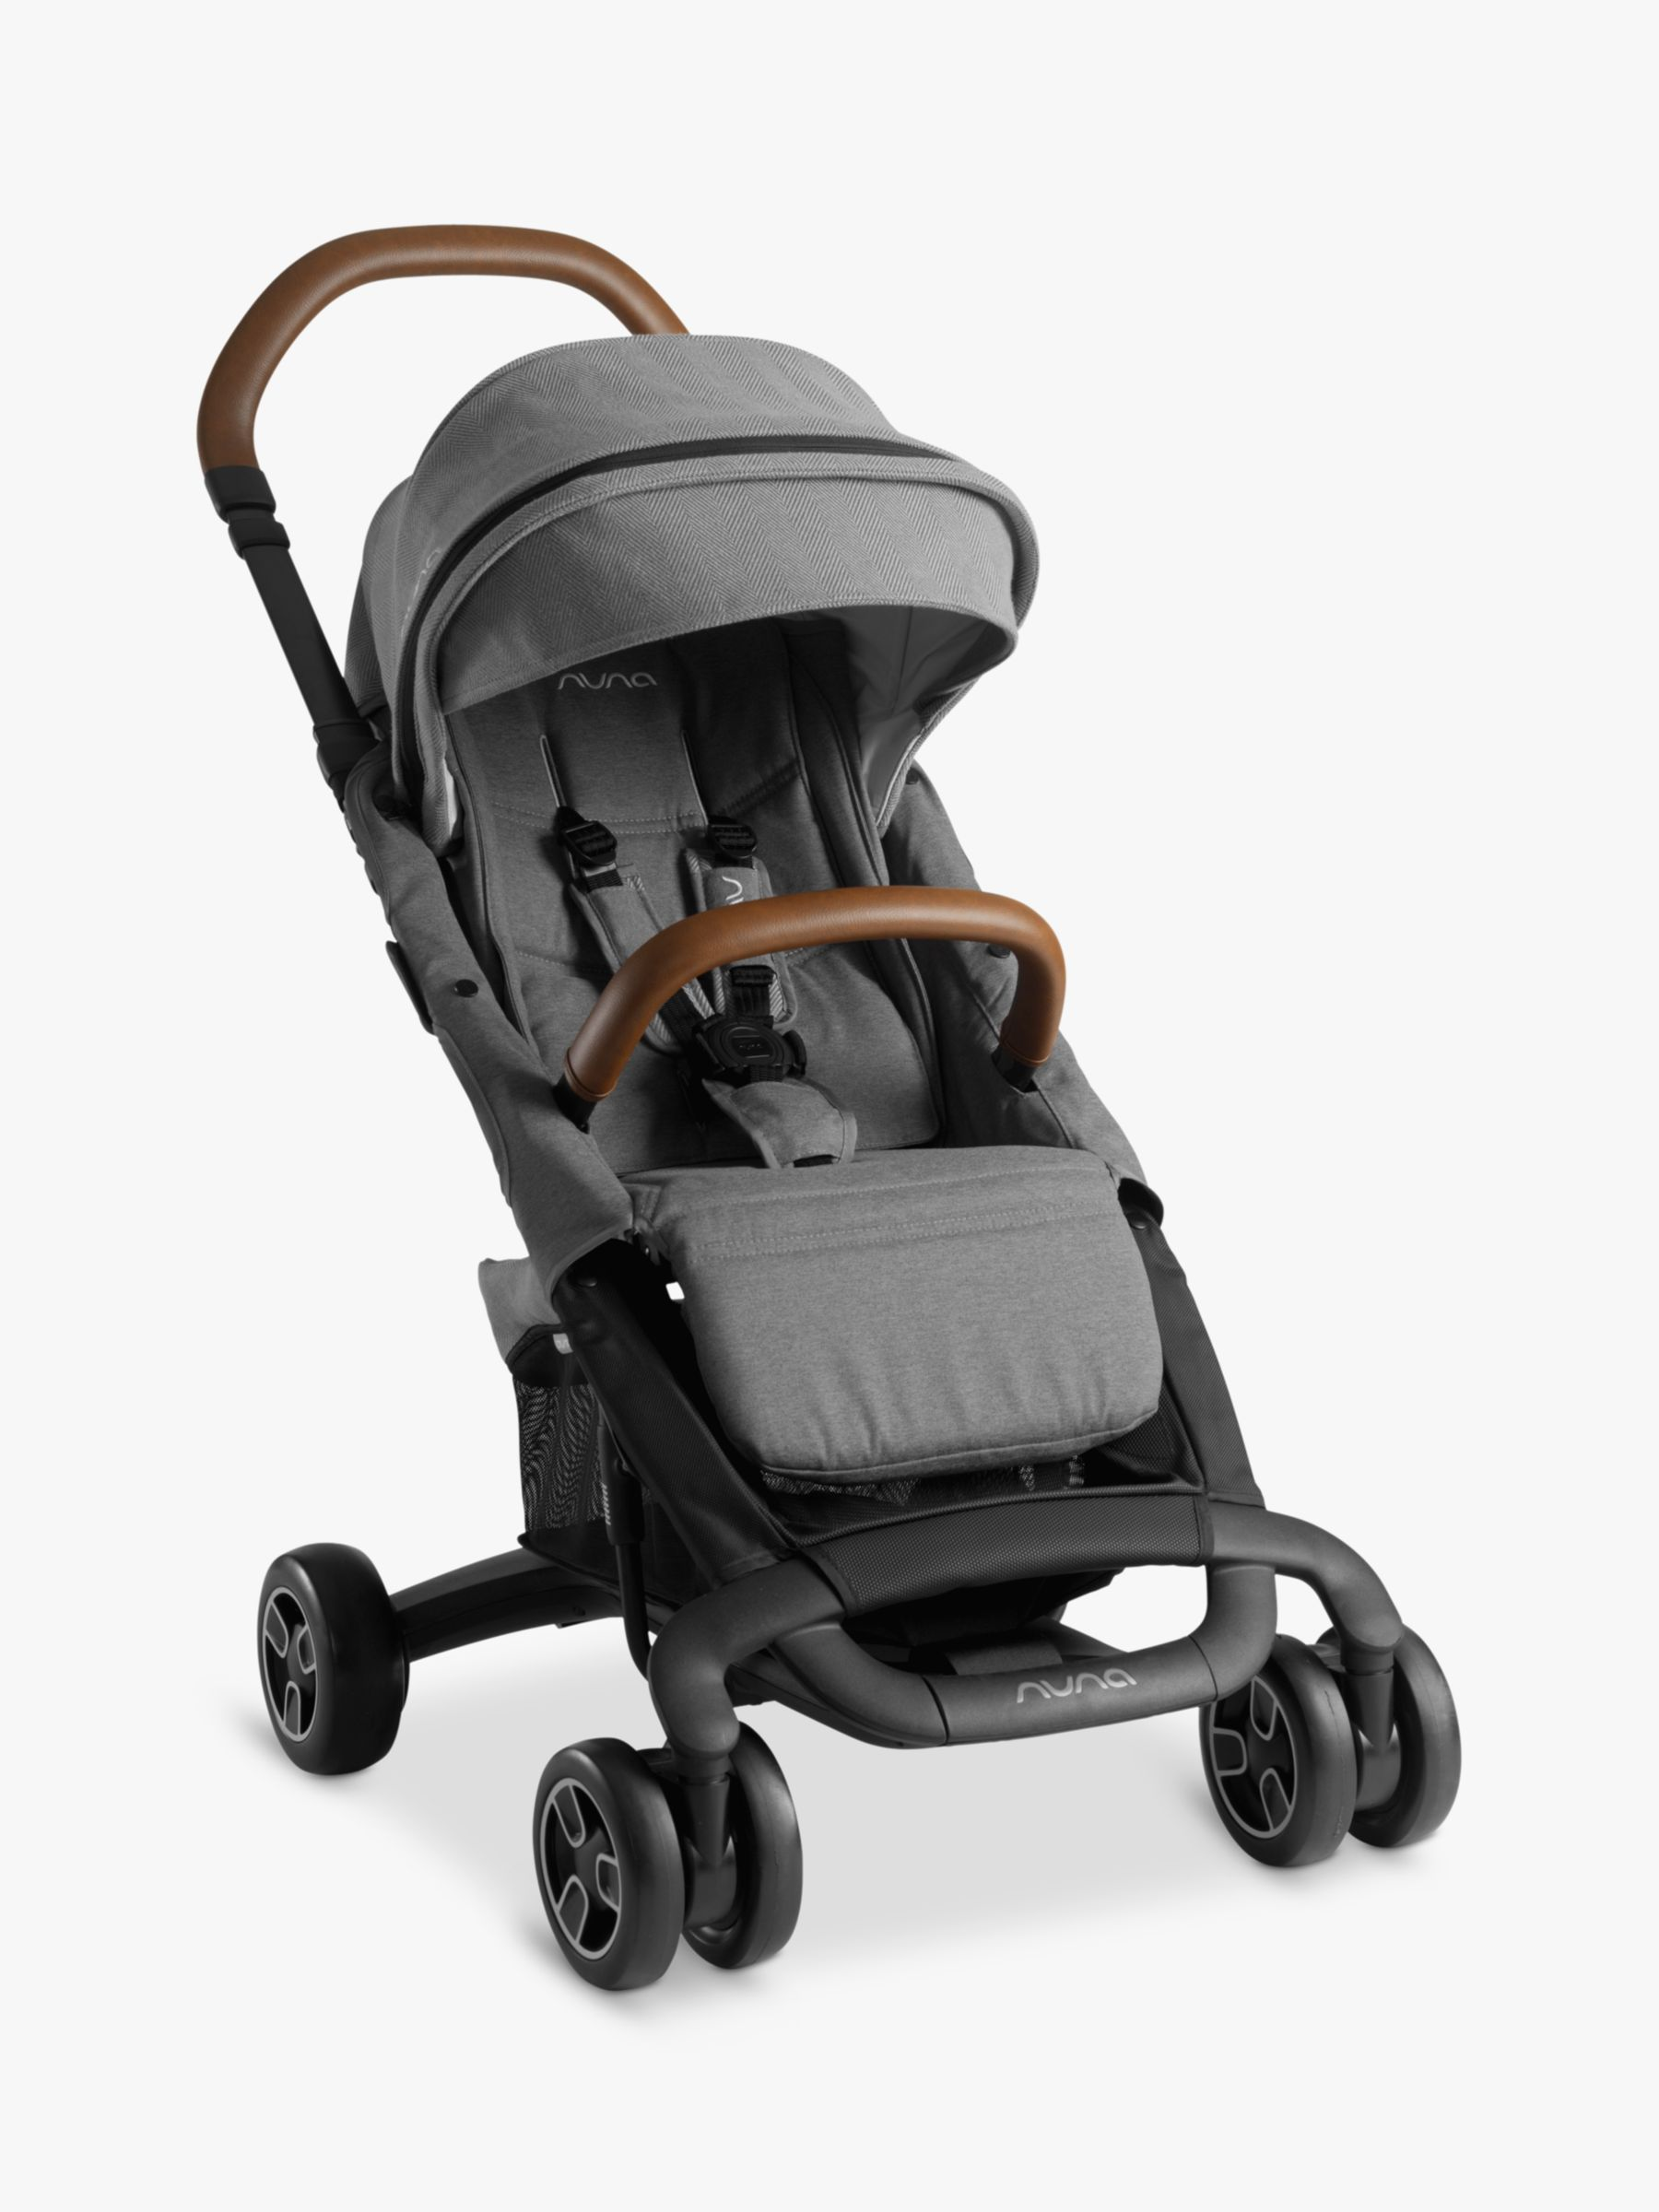 Nuna Nuna Pepp Next Oxford Collection Stroller, Grey